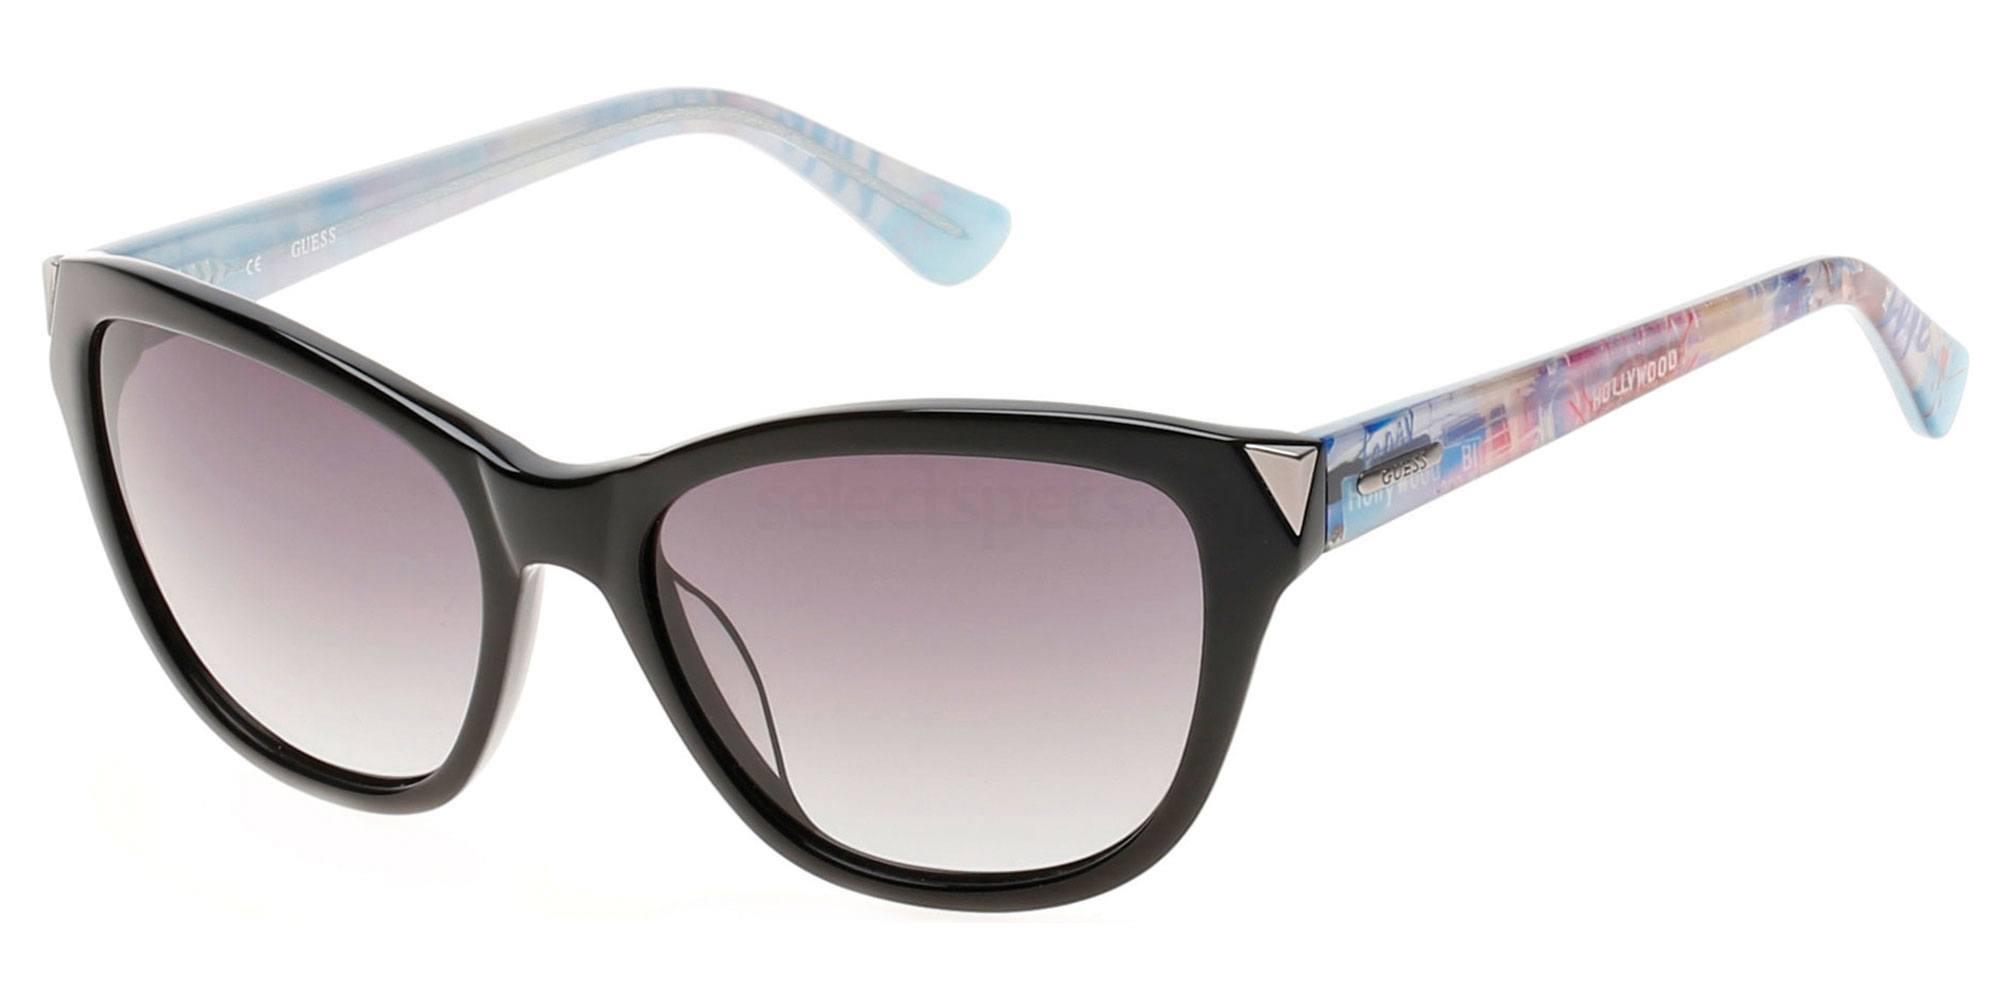 01B GU7398 Sunglasses, Guess